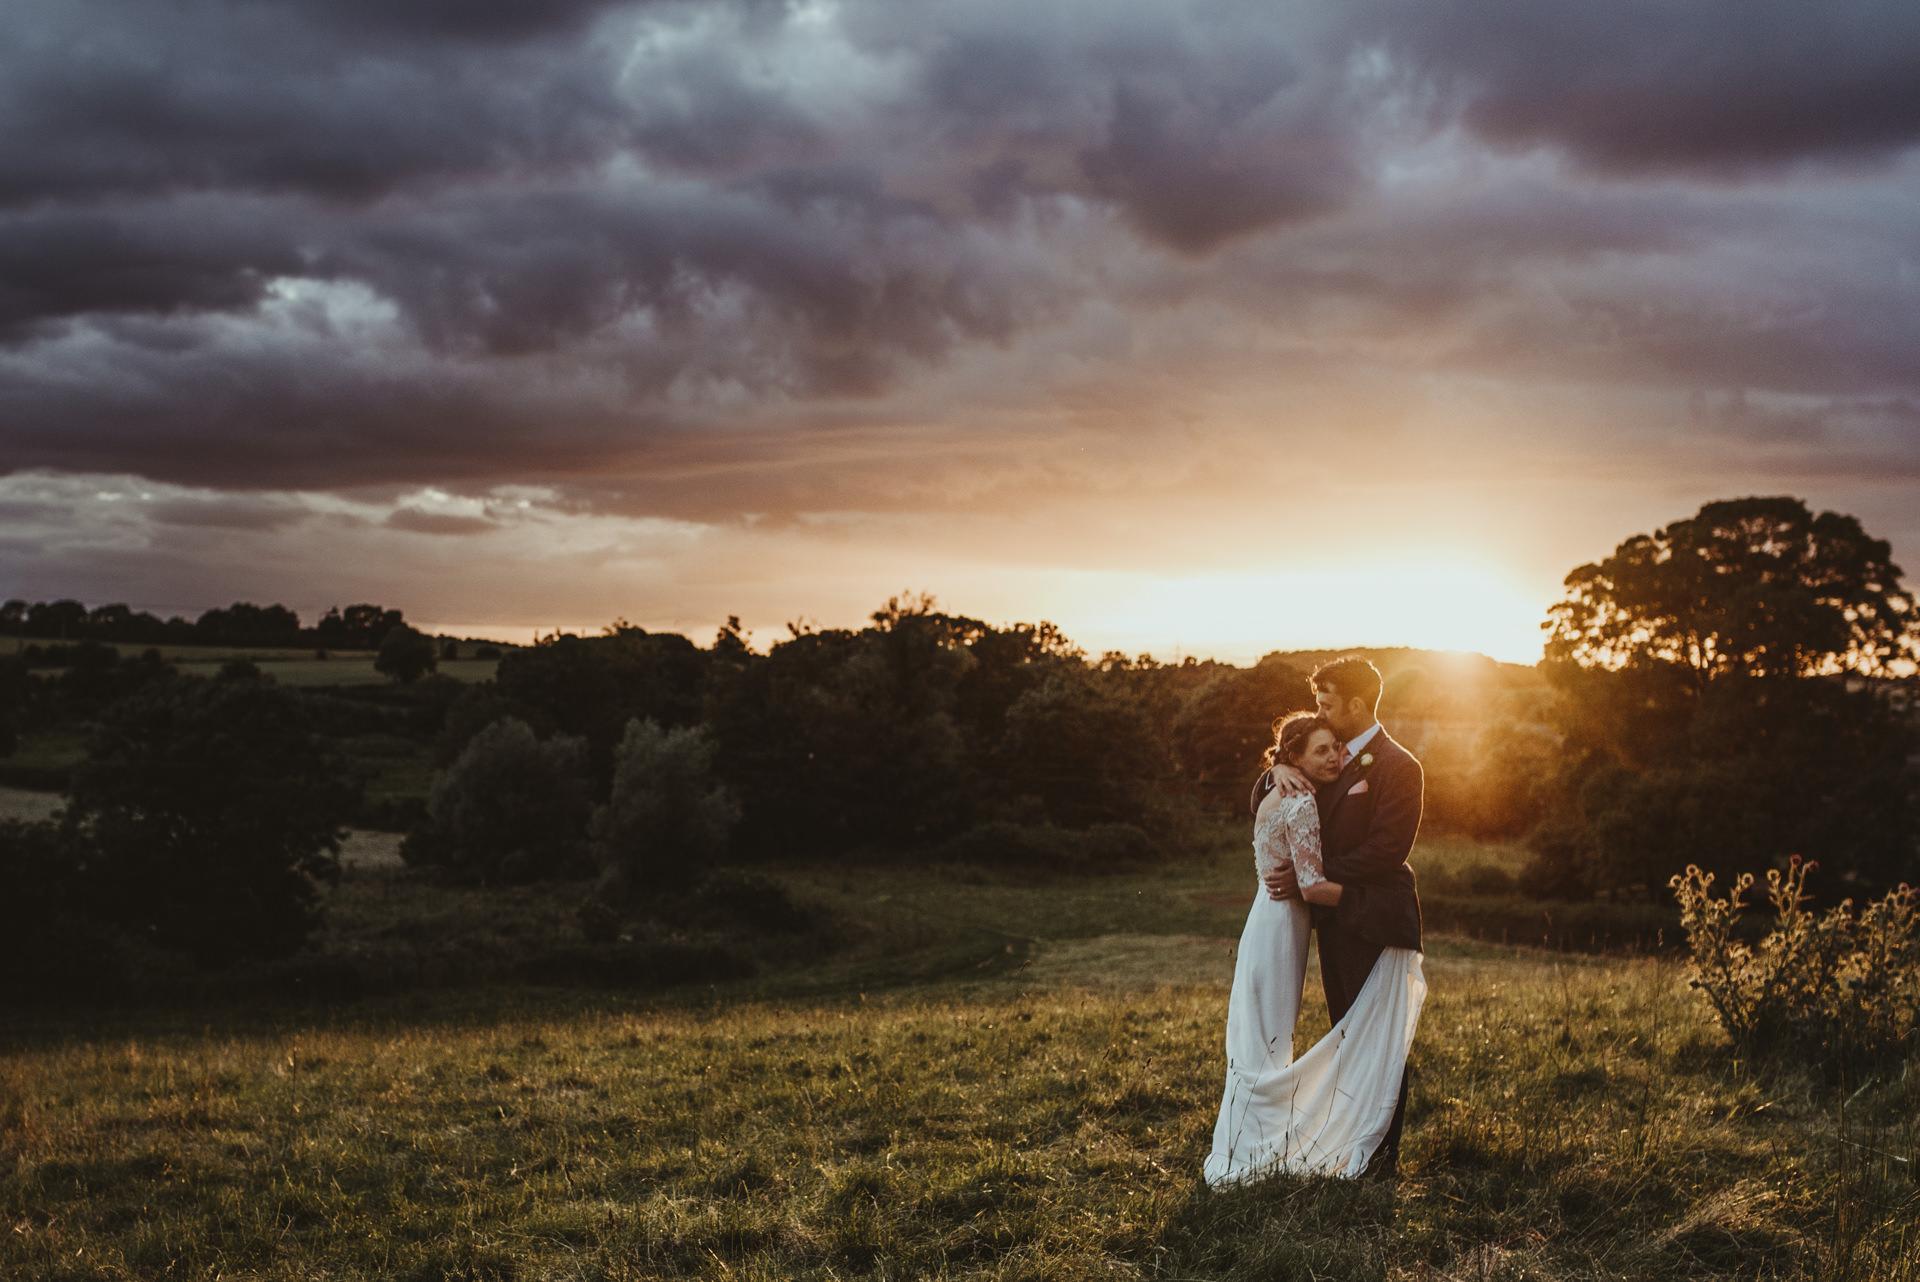 Essex Wedding Photographer Jess Soper Couple outside wedding